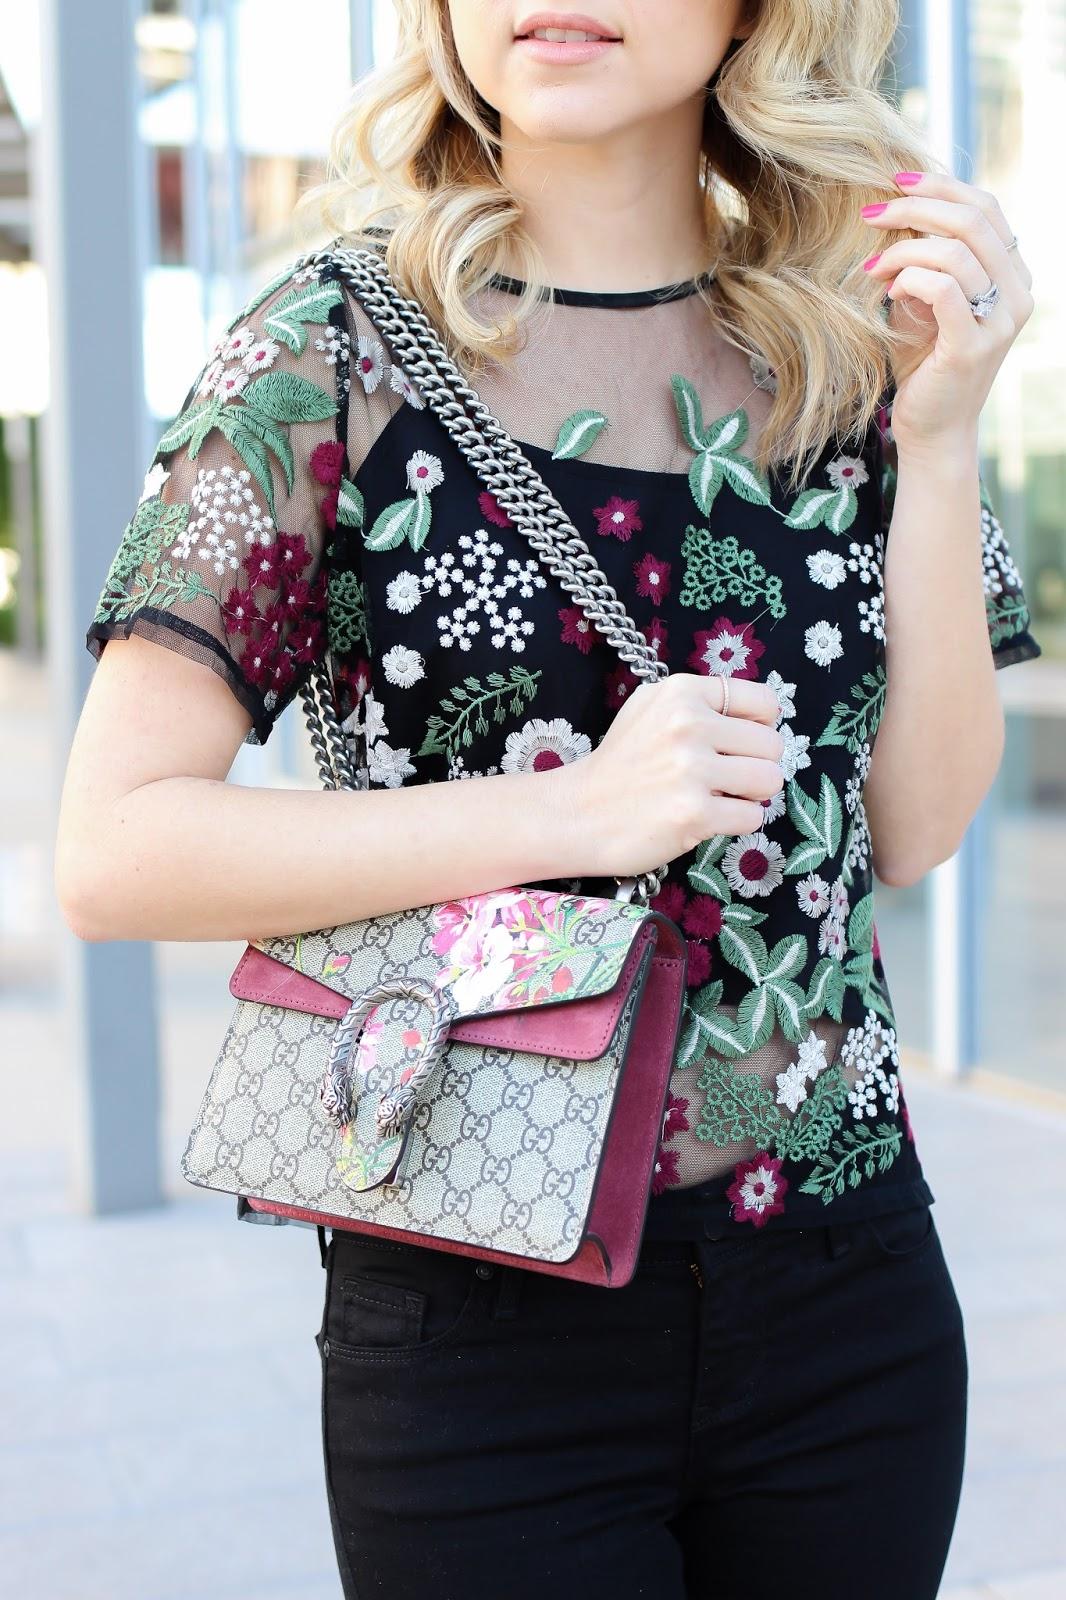 Gucci handbag - Gucci - Style blogger - fashion - Neiman Marcus - floral